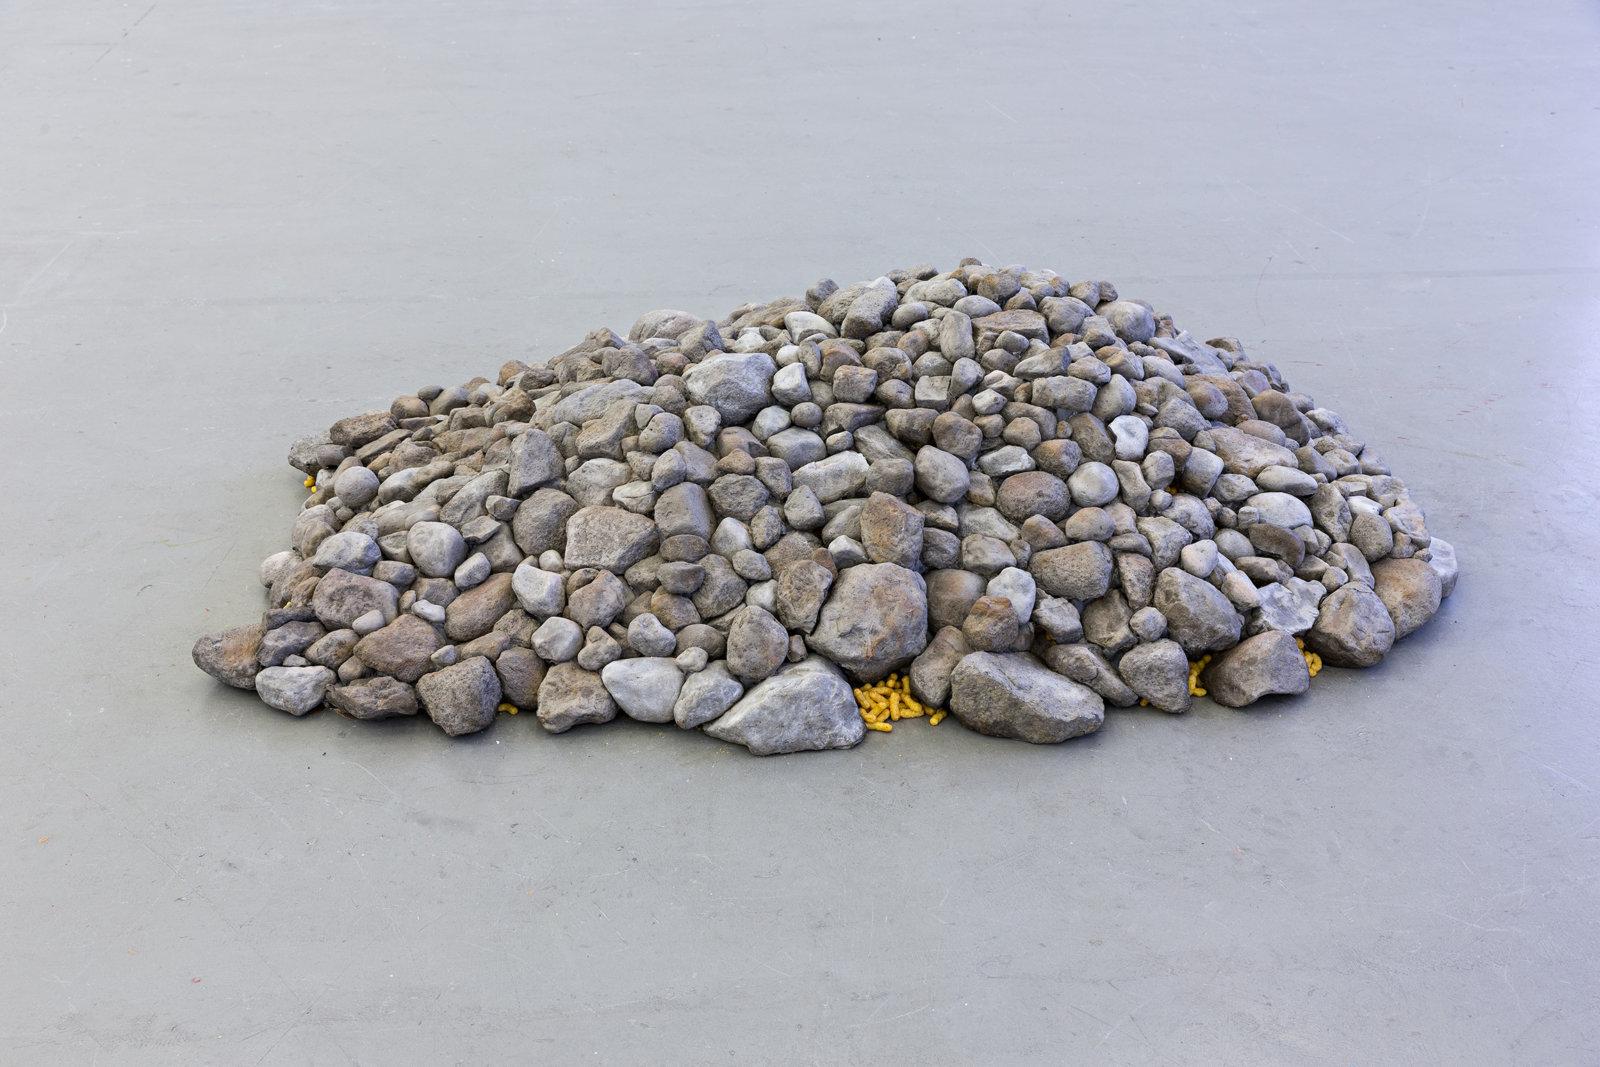 Liz Magor, Chee-to, 2000, polymerized gypsum, cheesies, 17 x 66 x 79 in. (42 x 168 x 200 cm) by Liz Magor